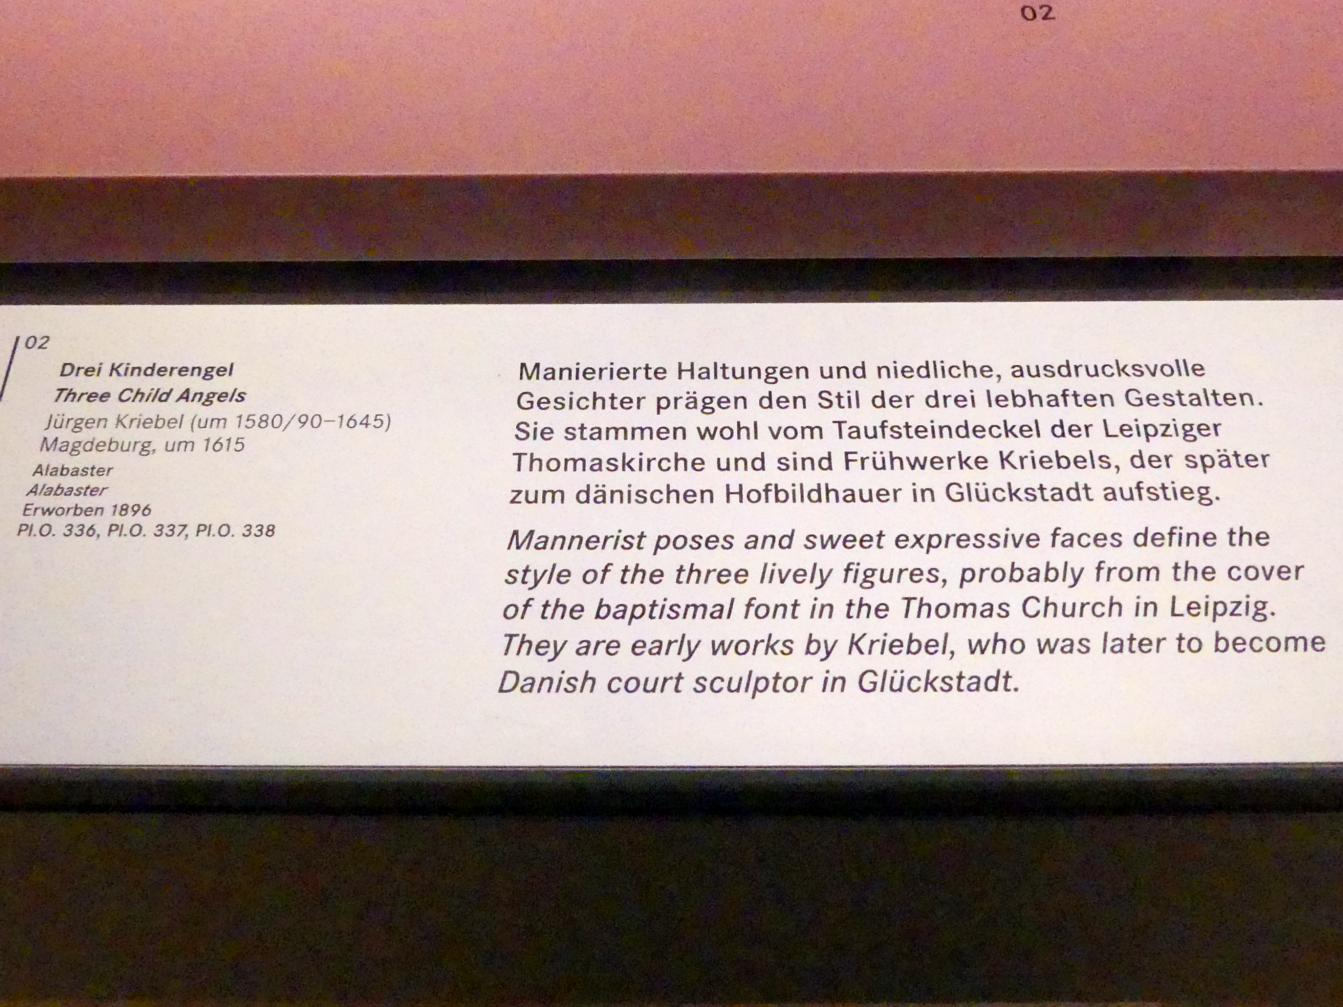 Jürgen Kriebel: Drei Kinderengel, Um 1615